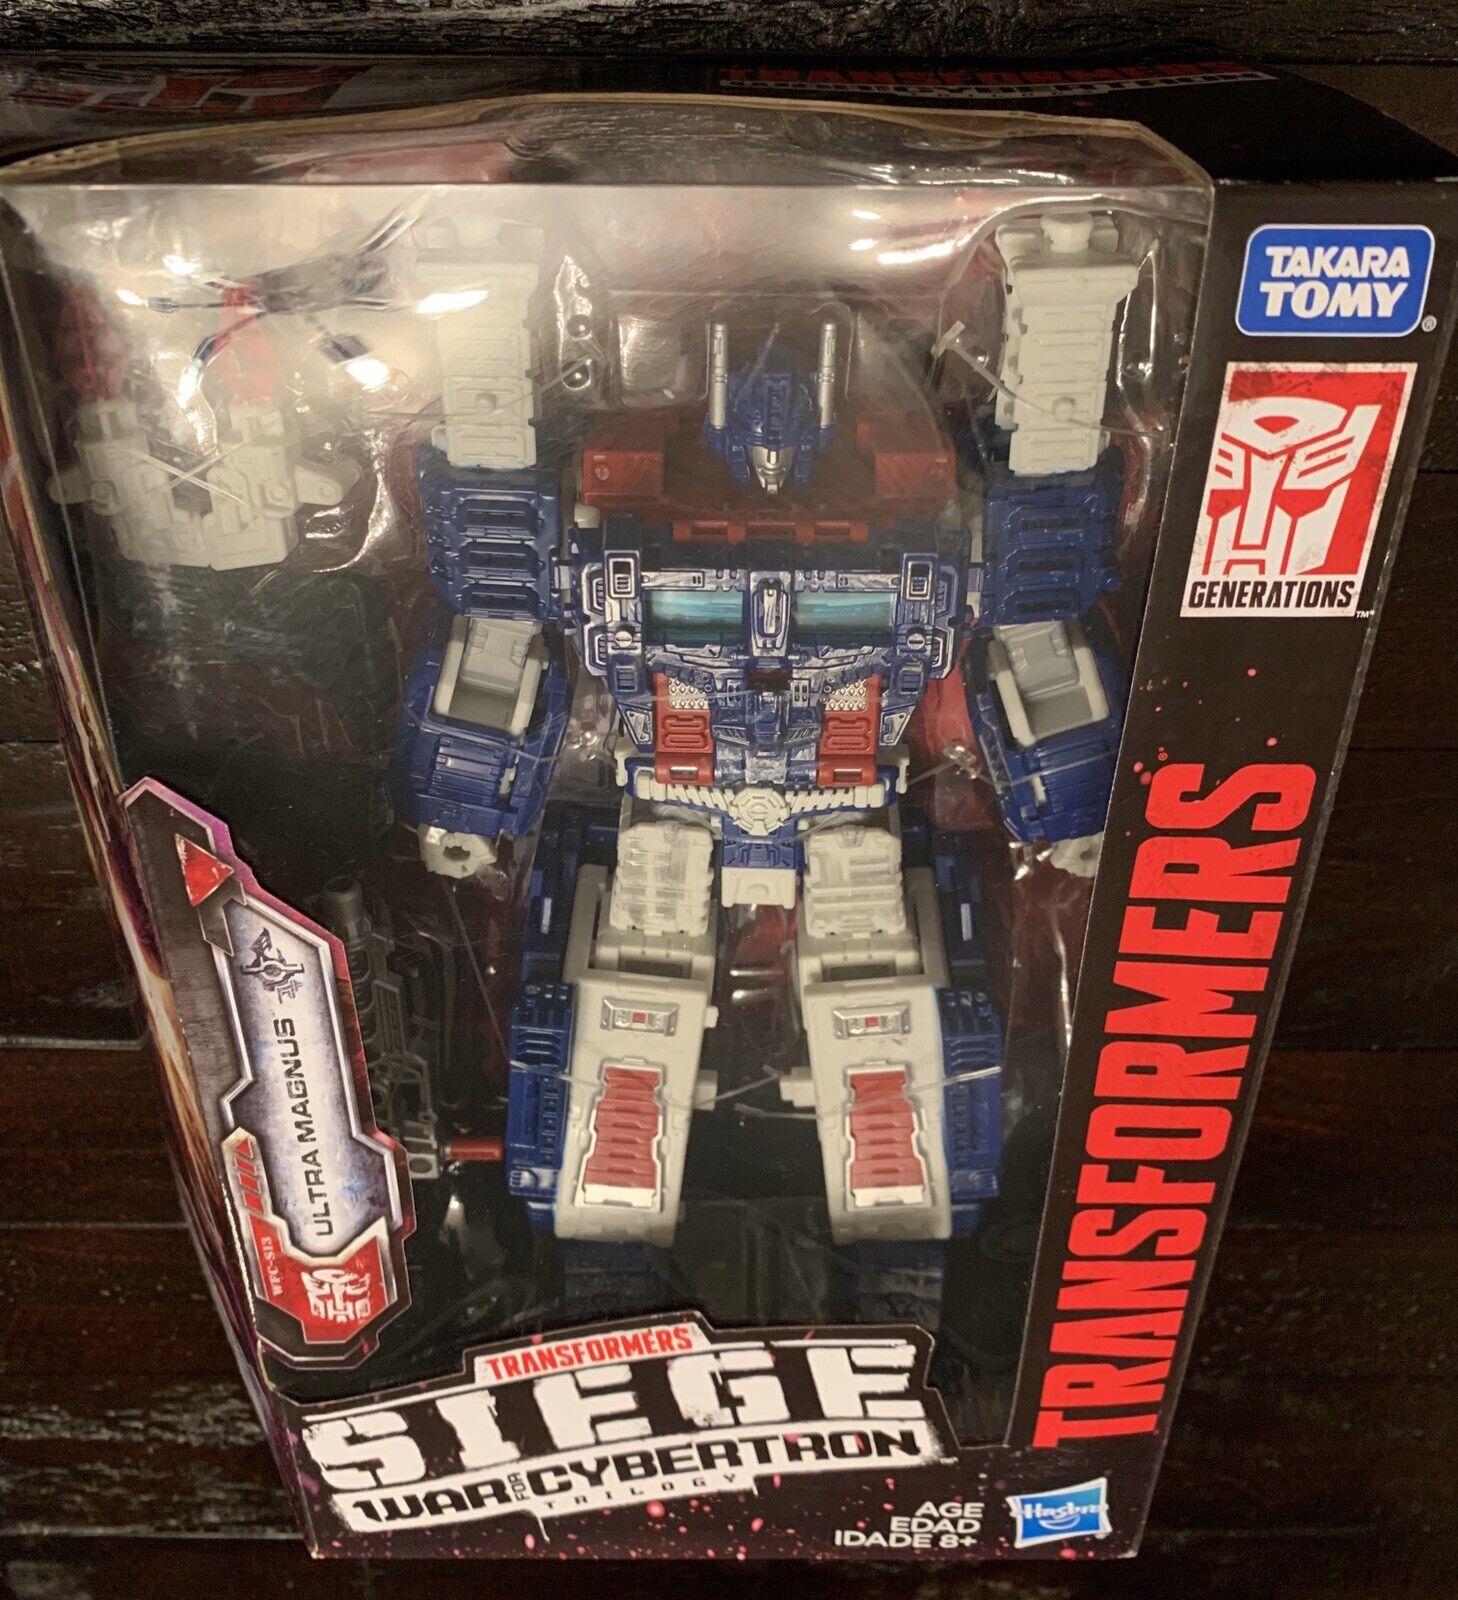 Líder de Transformers Ultra Magnus Cybertron asedio  guerra por Cybertron foc Takara